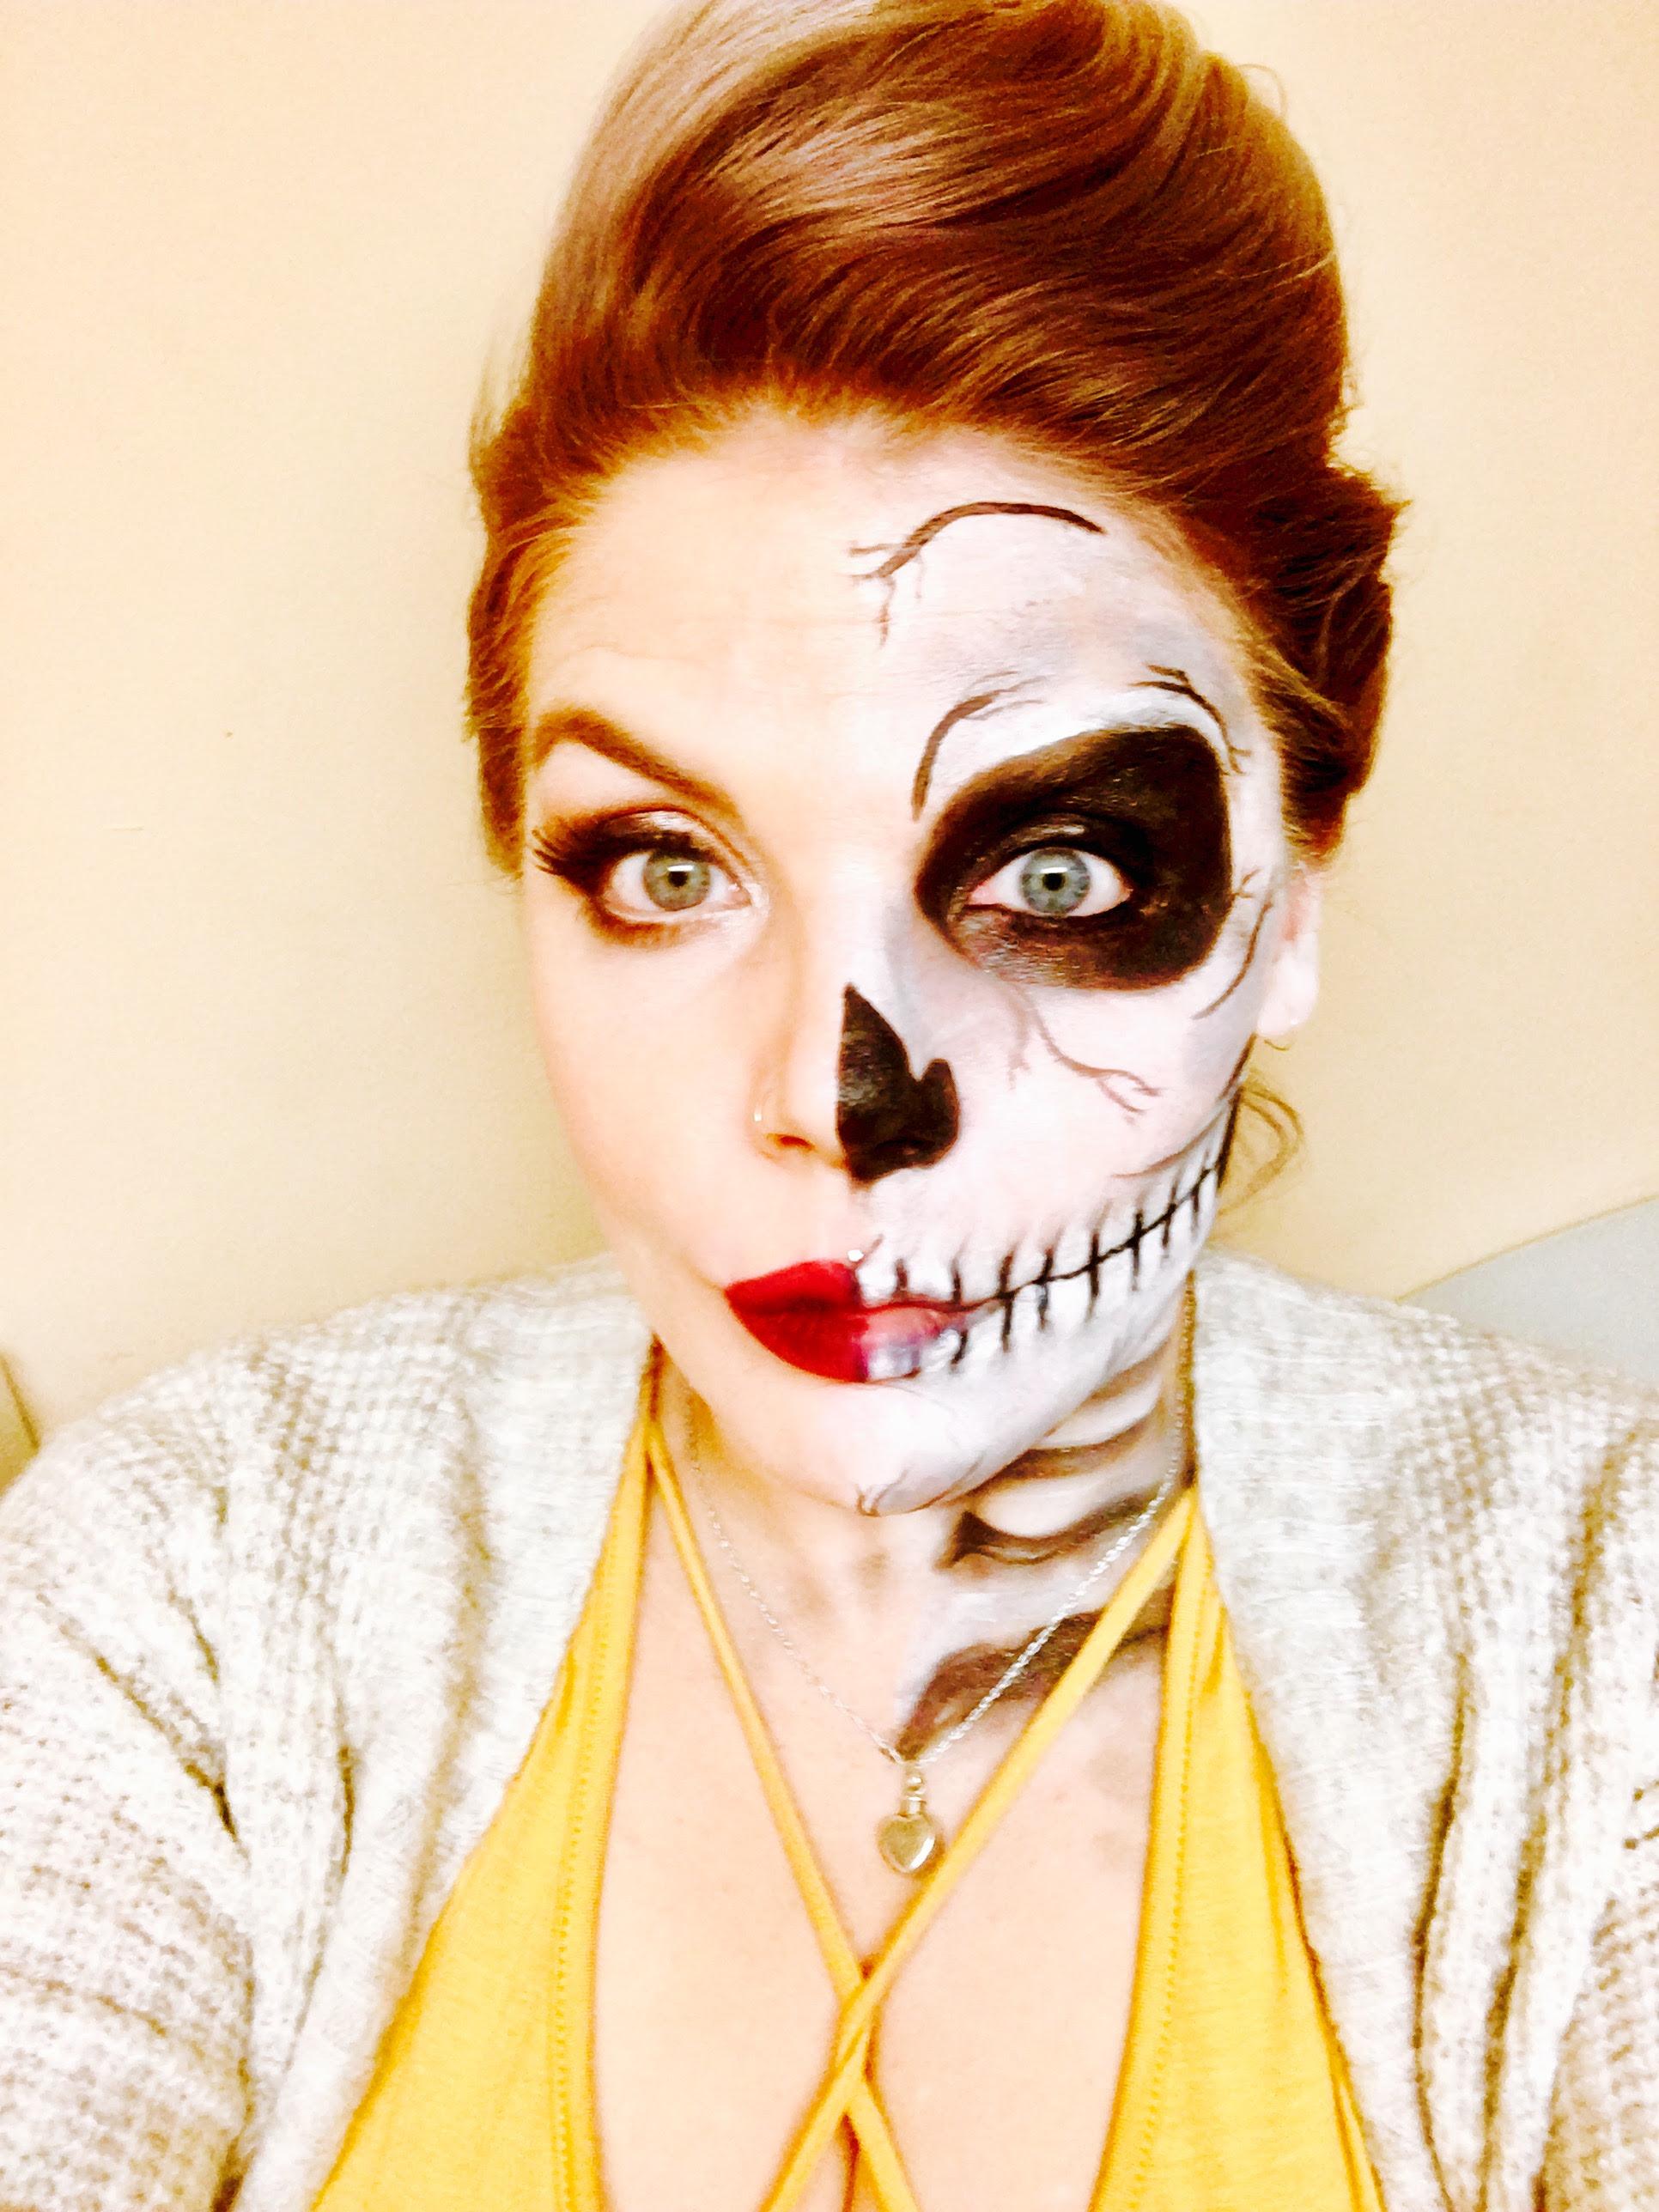 Half Skull Half Face Drawing At Getdrawingscom Free For Personal